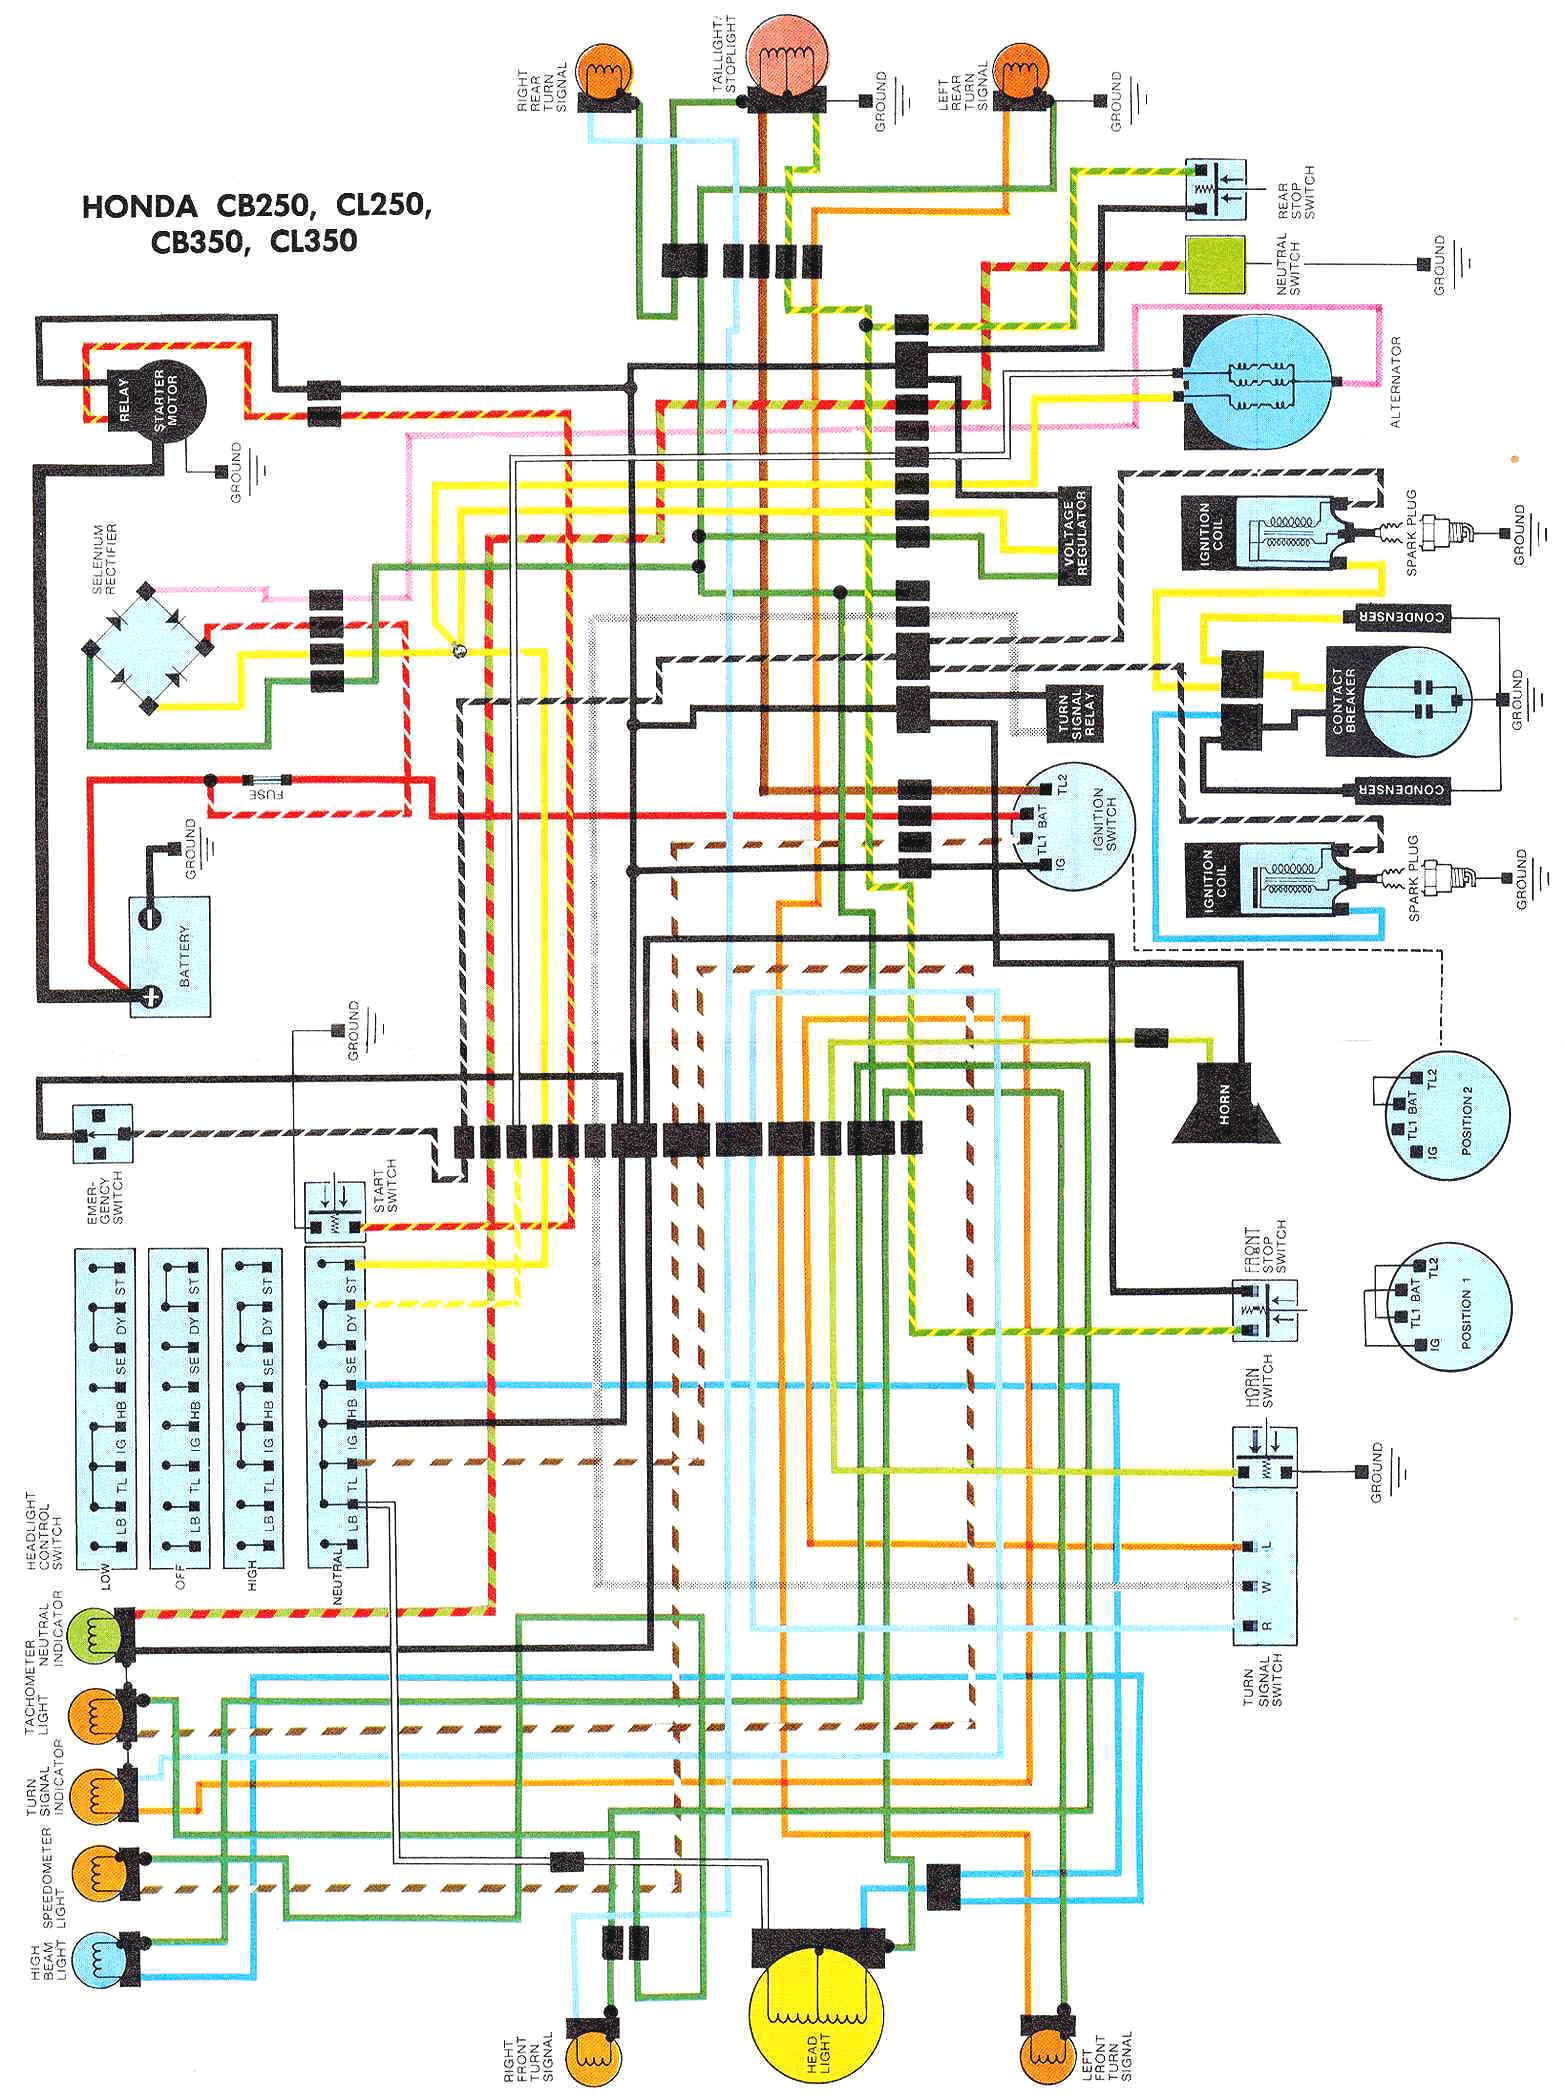 hight resolution of honda vt700 wiring diagrams honda get free image about 1984 honda shadow vt700 wiring diagram 1984